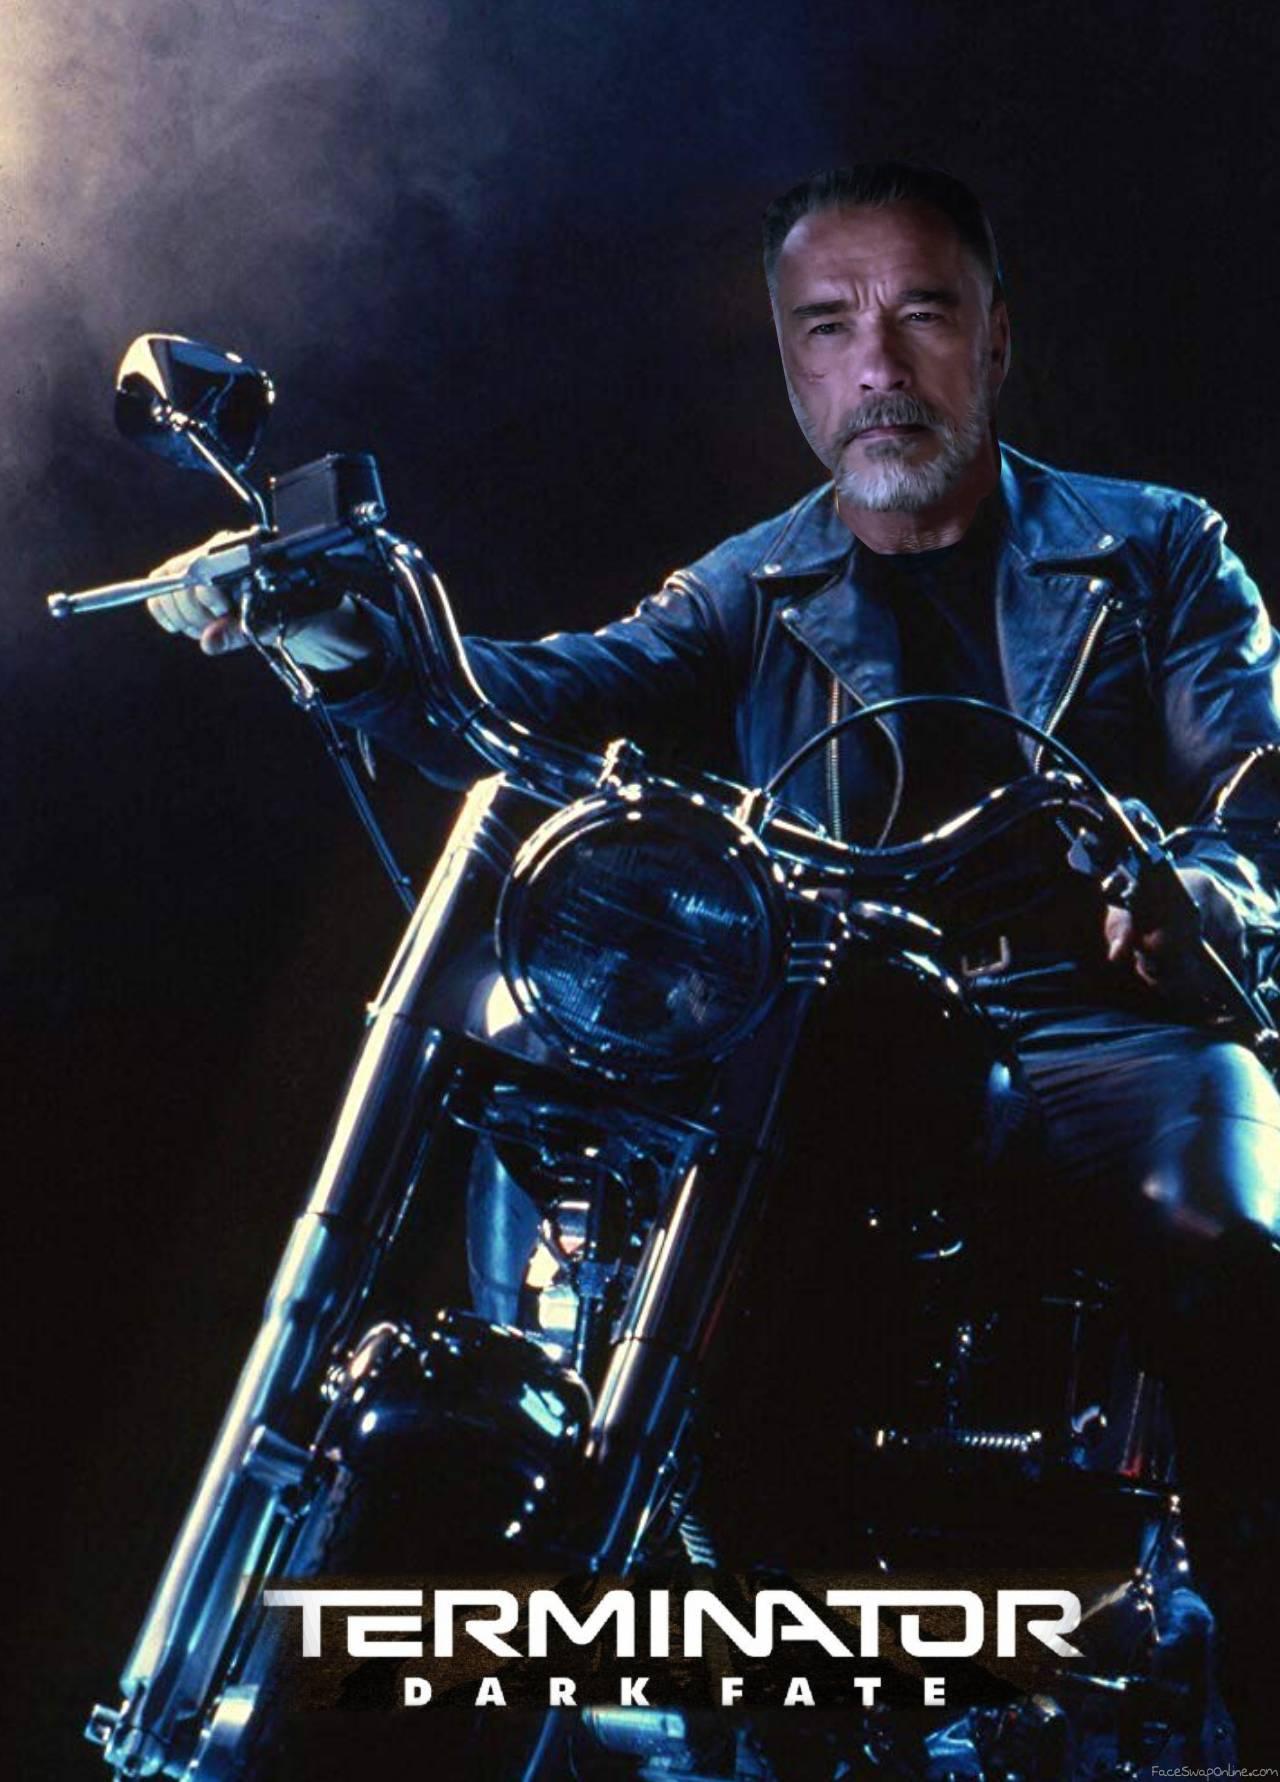 Terminator 6 Dark Fate poster